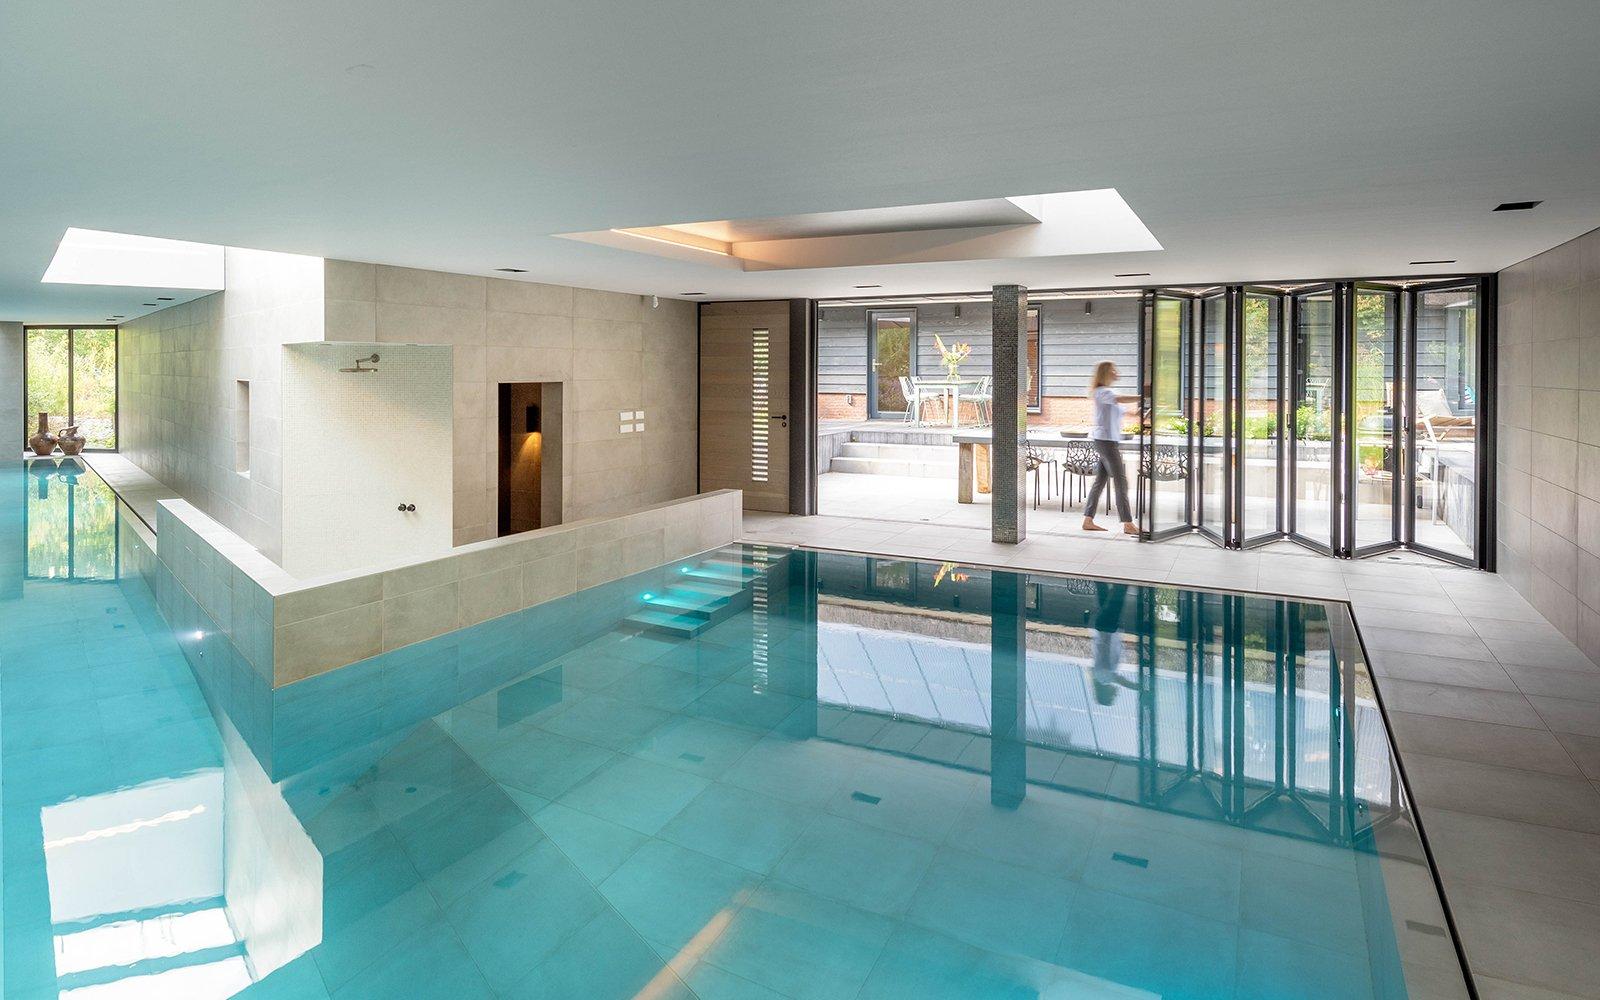 Harmonica glazen vouwwand, Solarlux, ondergronds binnenzwembad